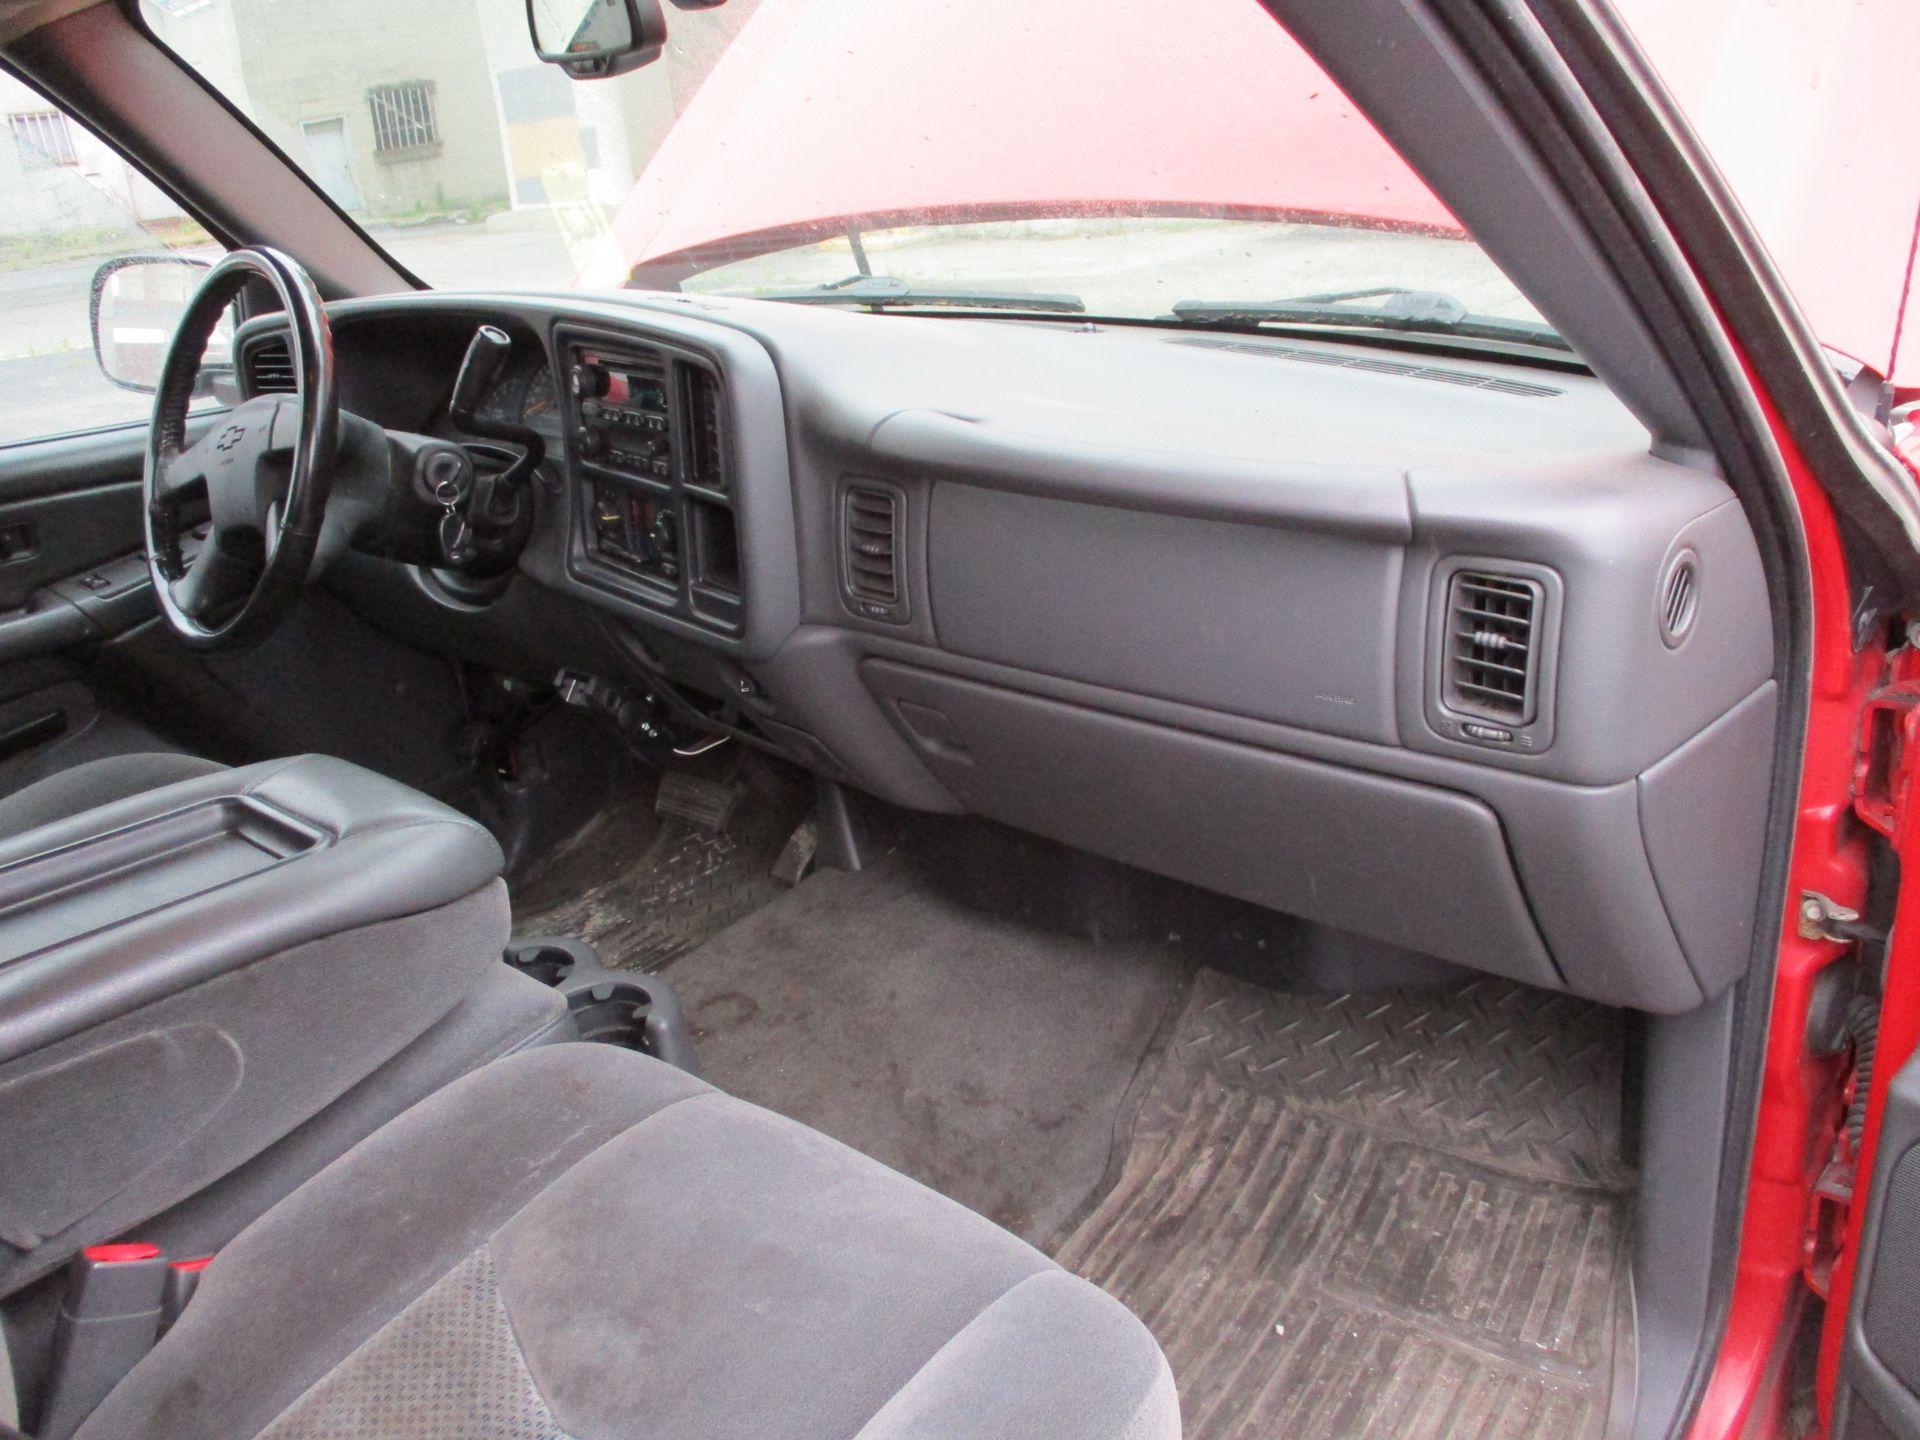 2006 Chevrolet Silverado 1500 LT Pickup, VIN 1GCEC14V96E251510, Regular Cab, Automatic, AC, 8' - Image 17 of 21